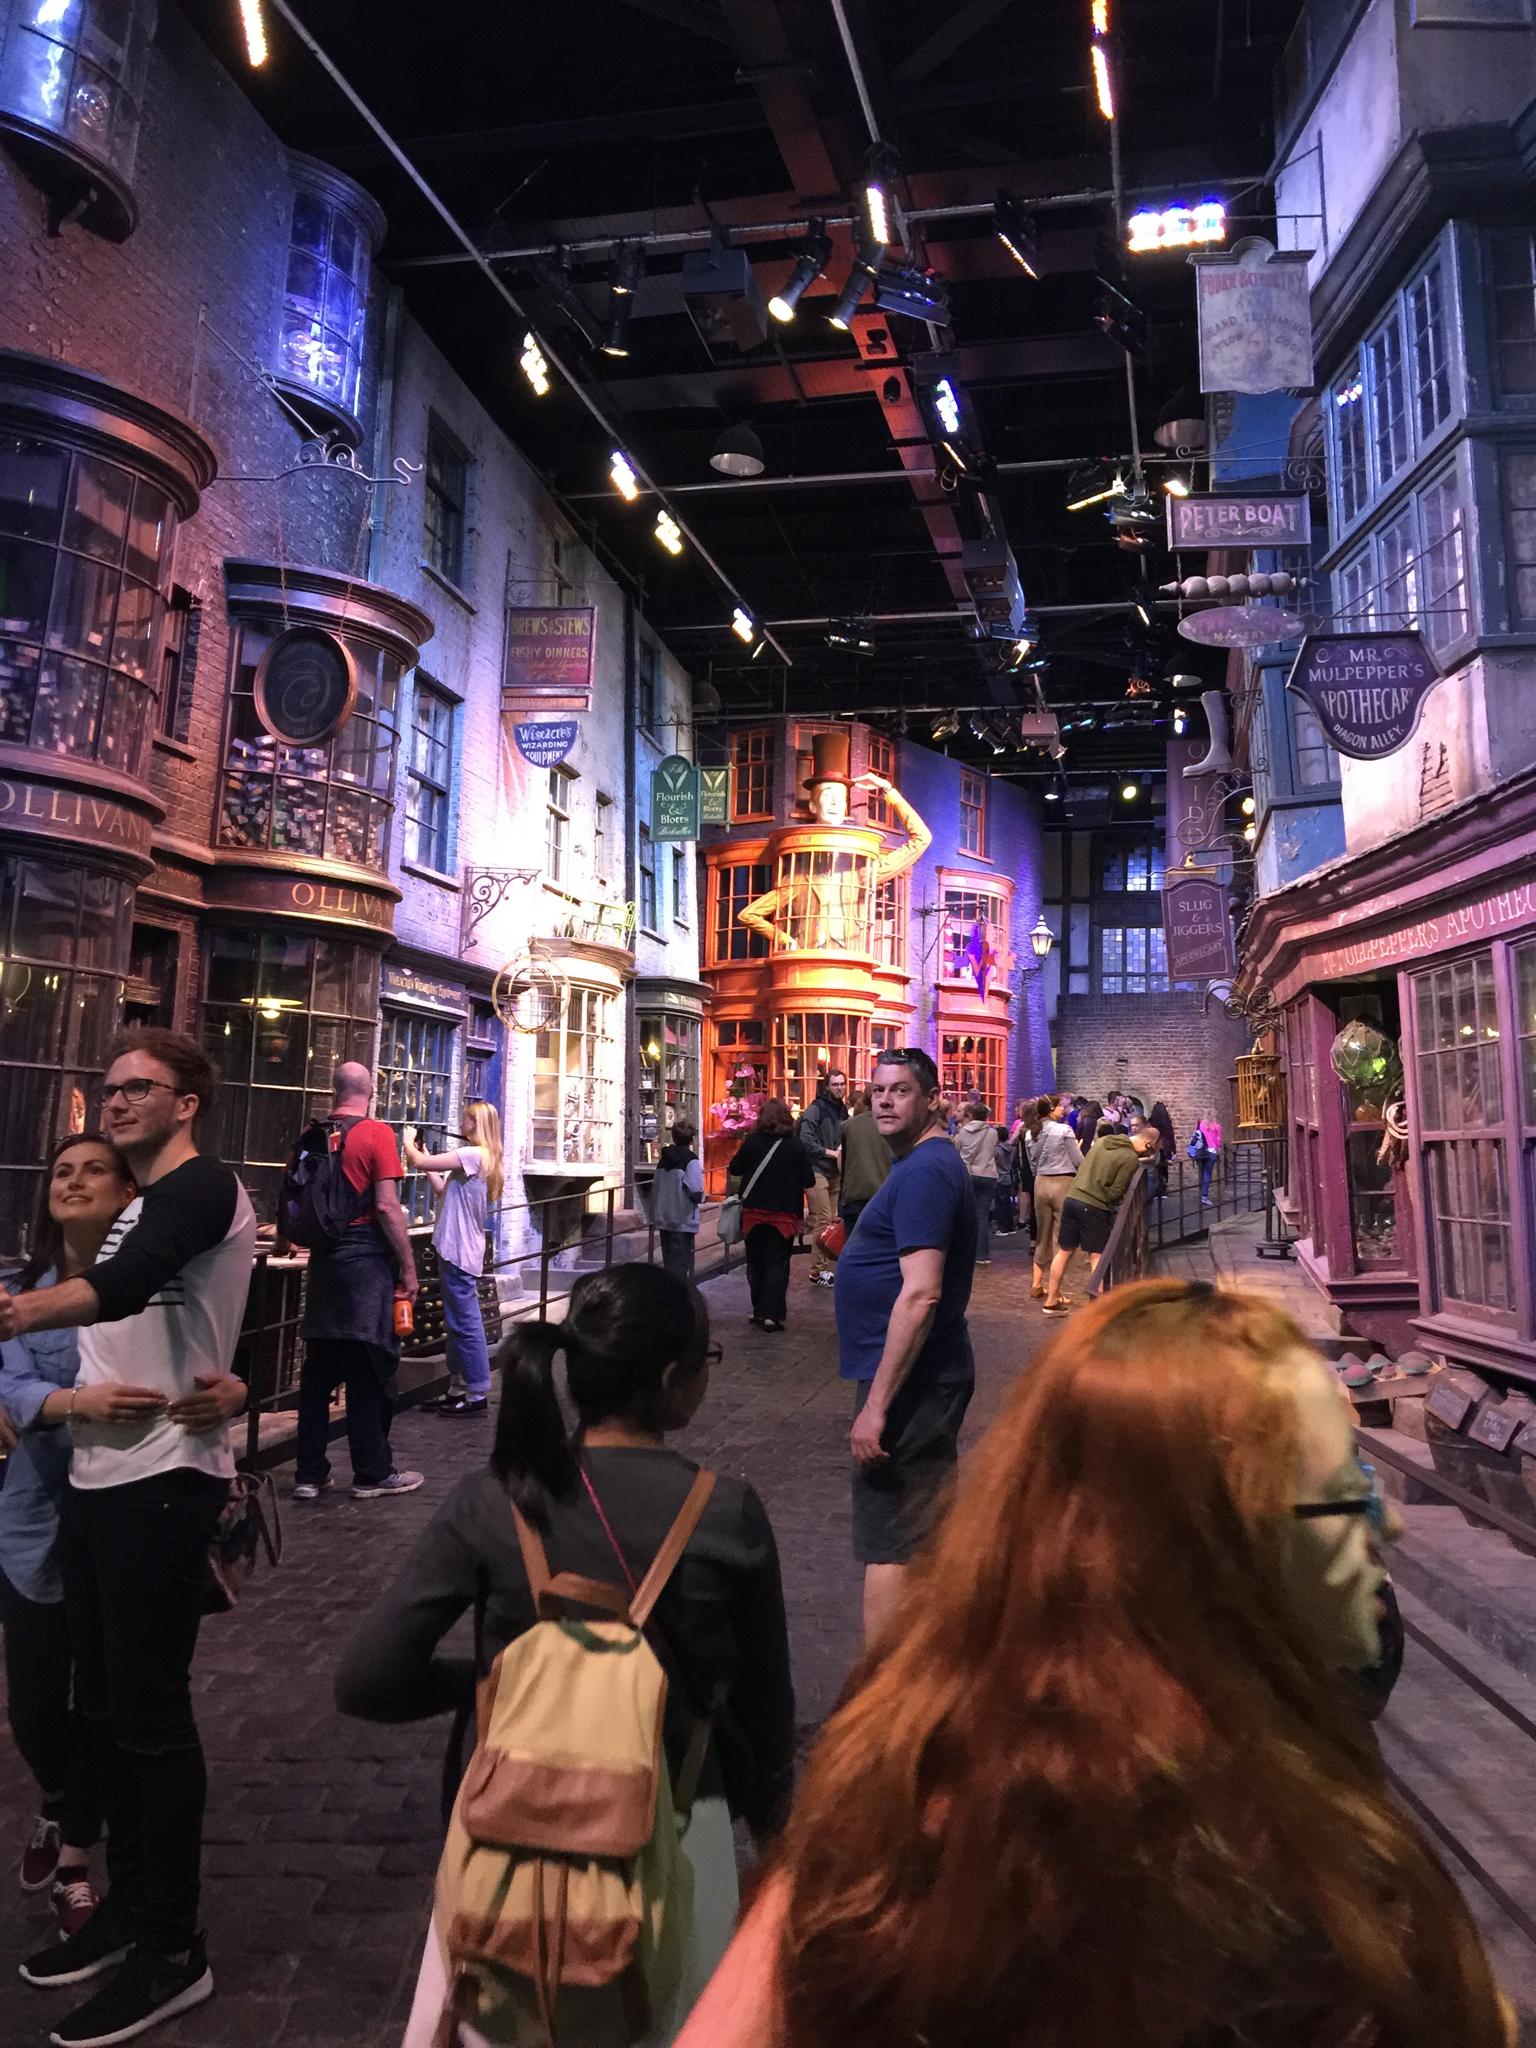 Visiting Harry Potter Warner Bros Studio Tour, London